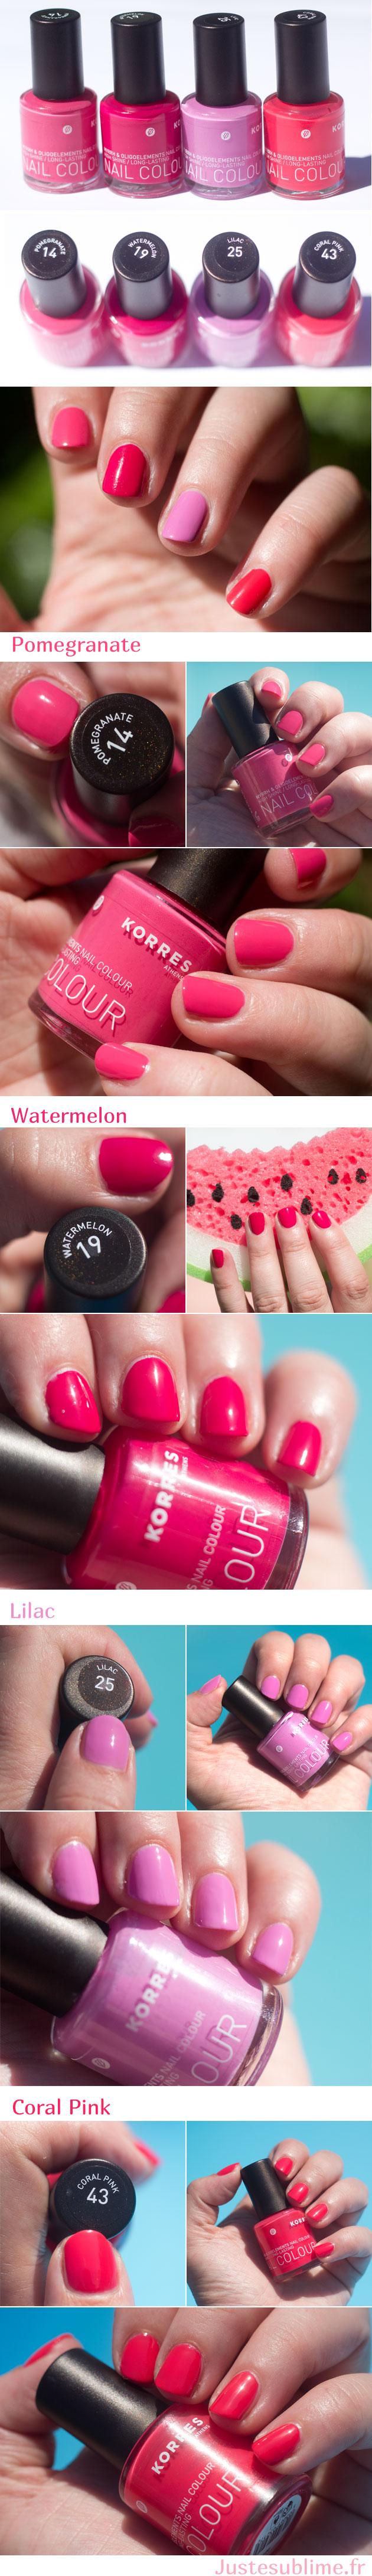 Korres nail polish: safe ingredients, wonderful colors!!! I am so ...